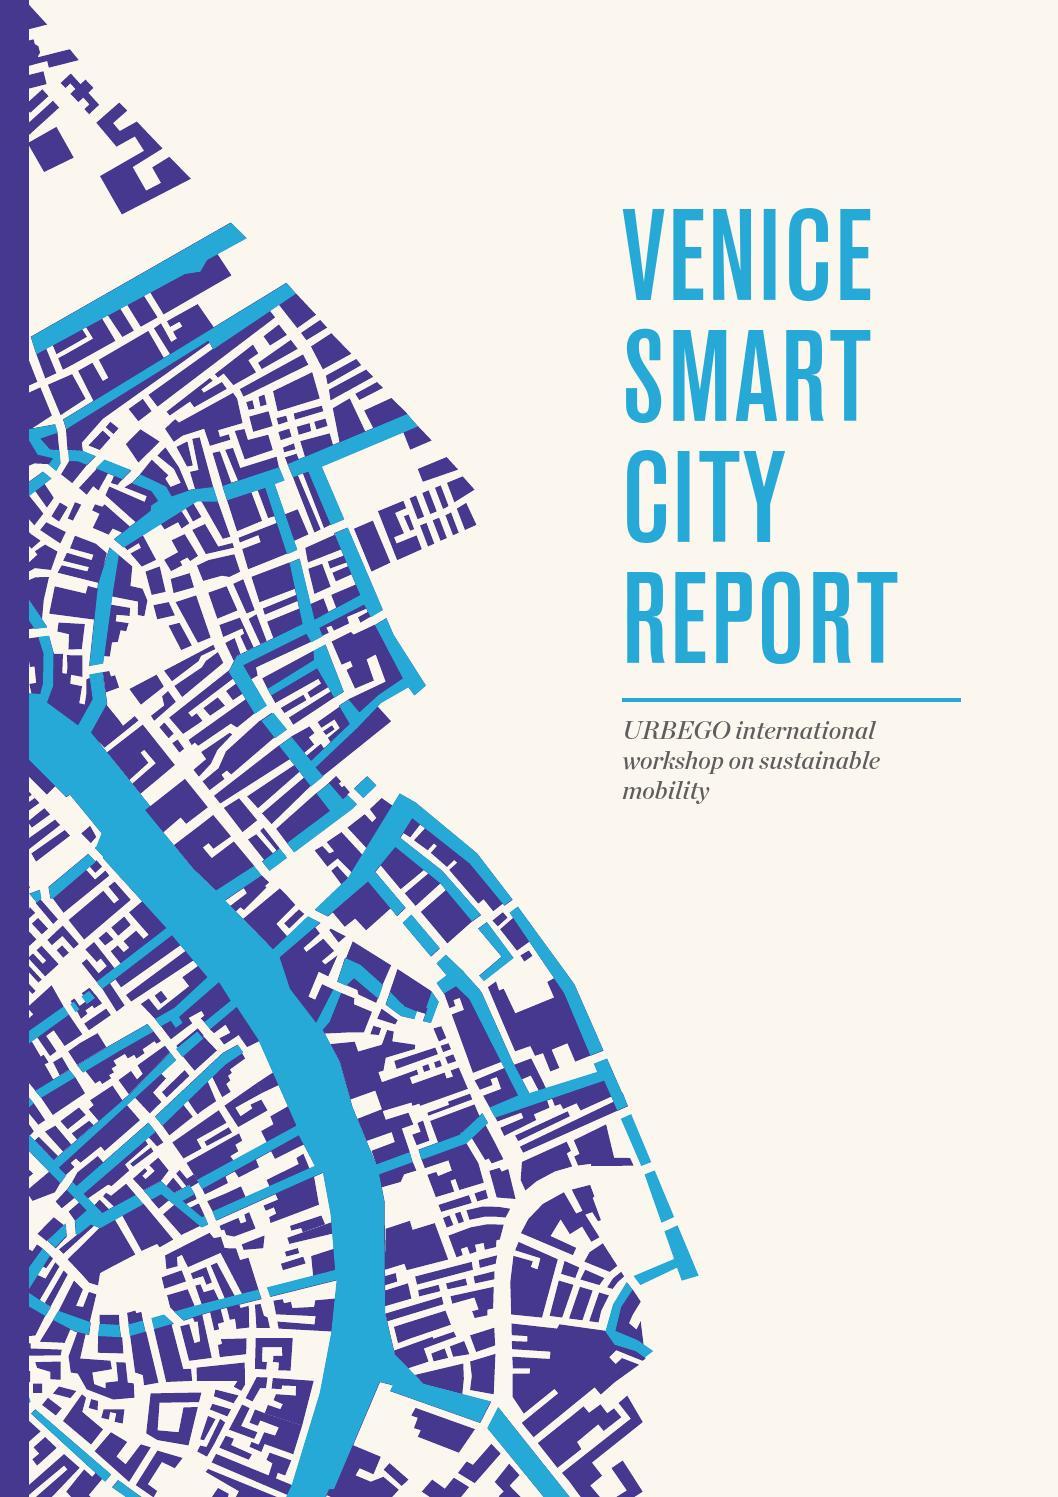 venice smart city report by urbego